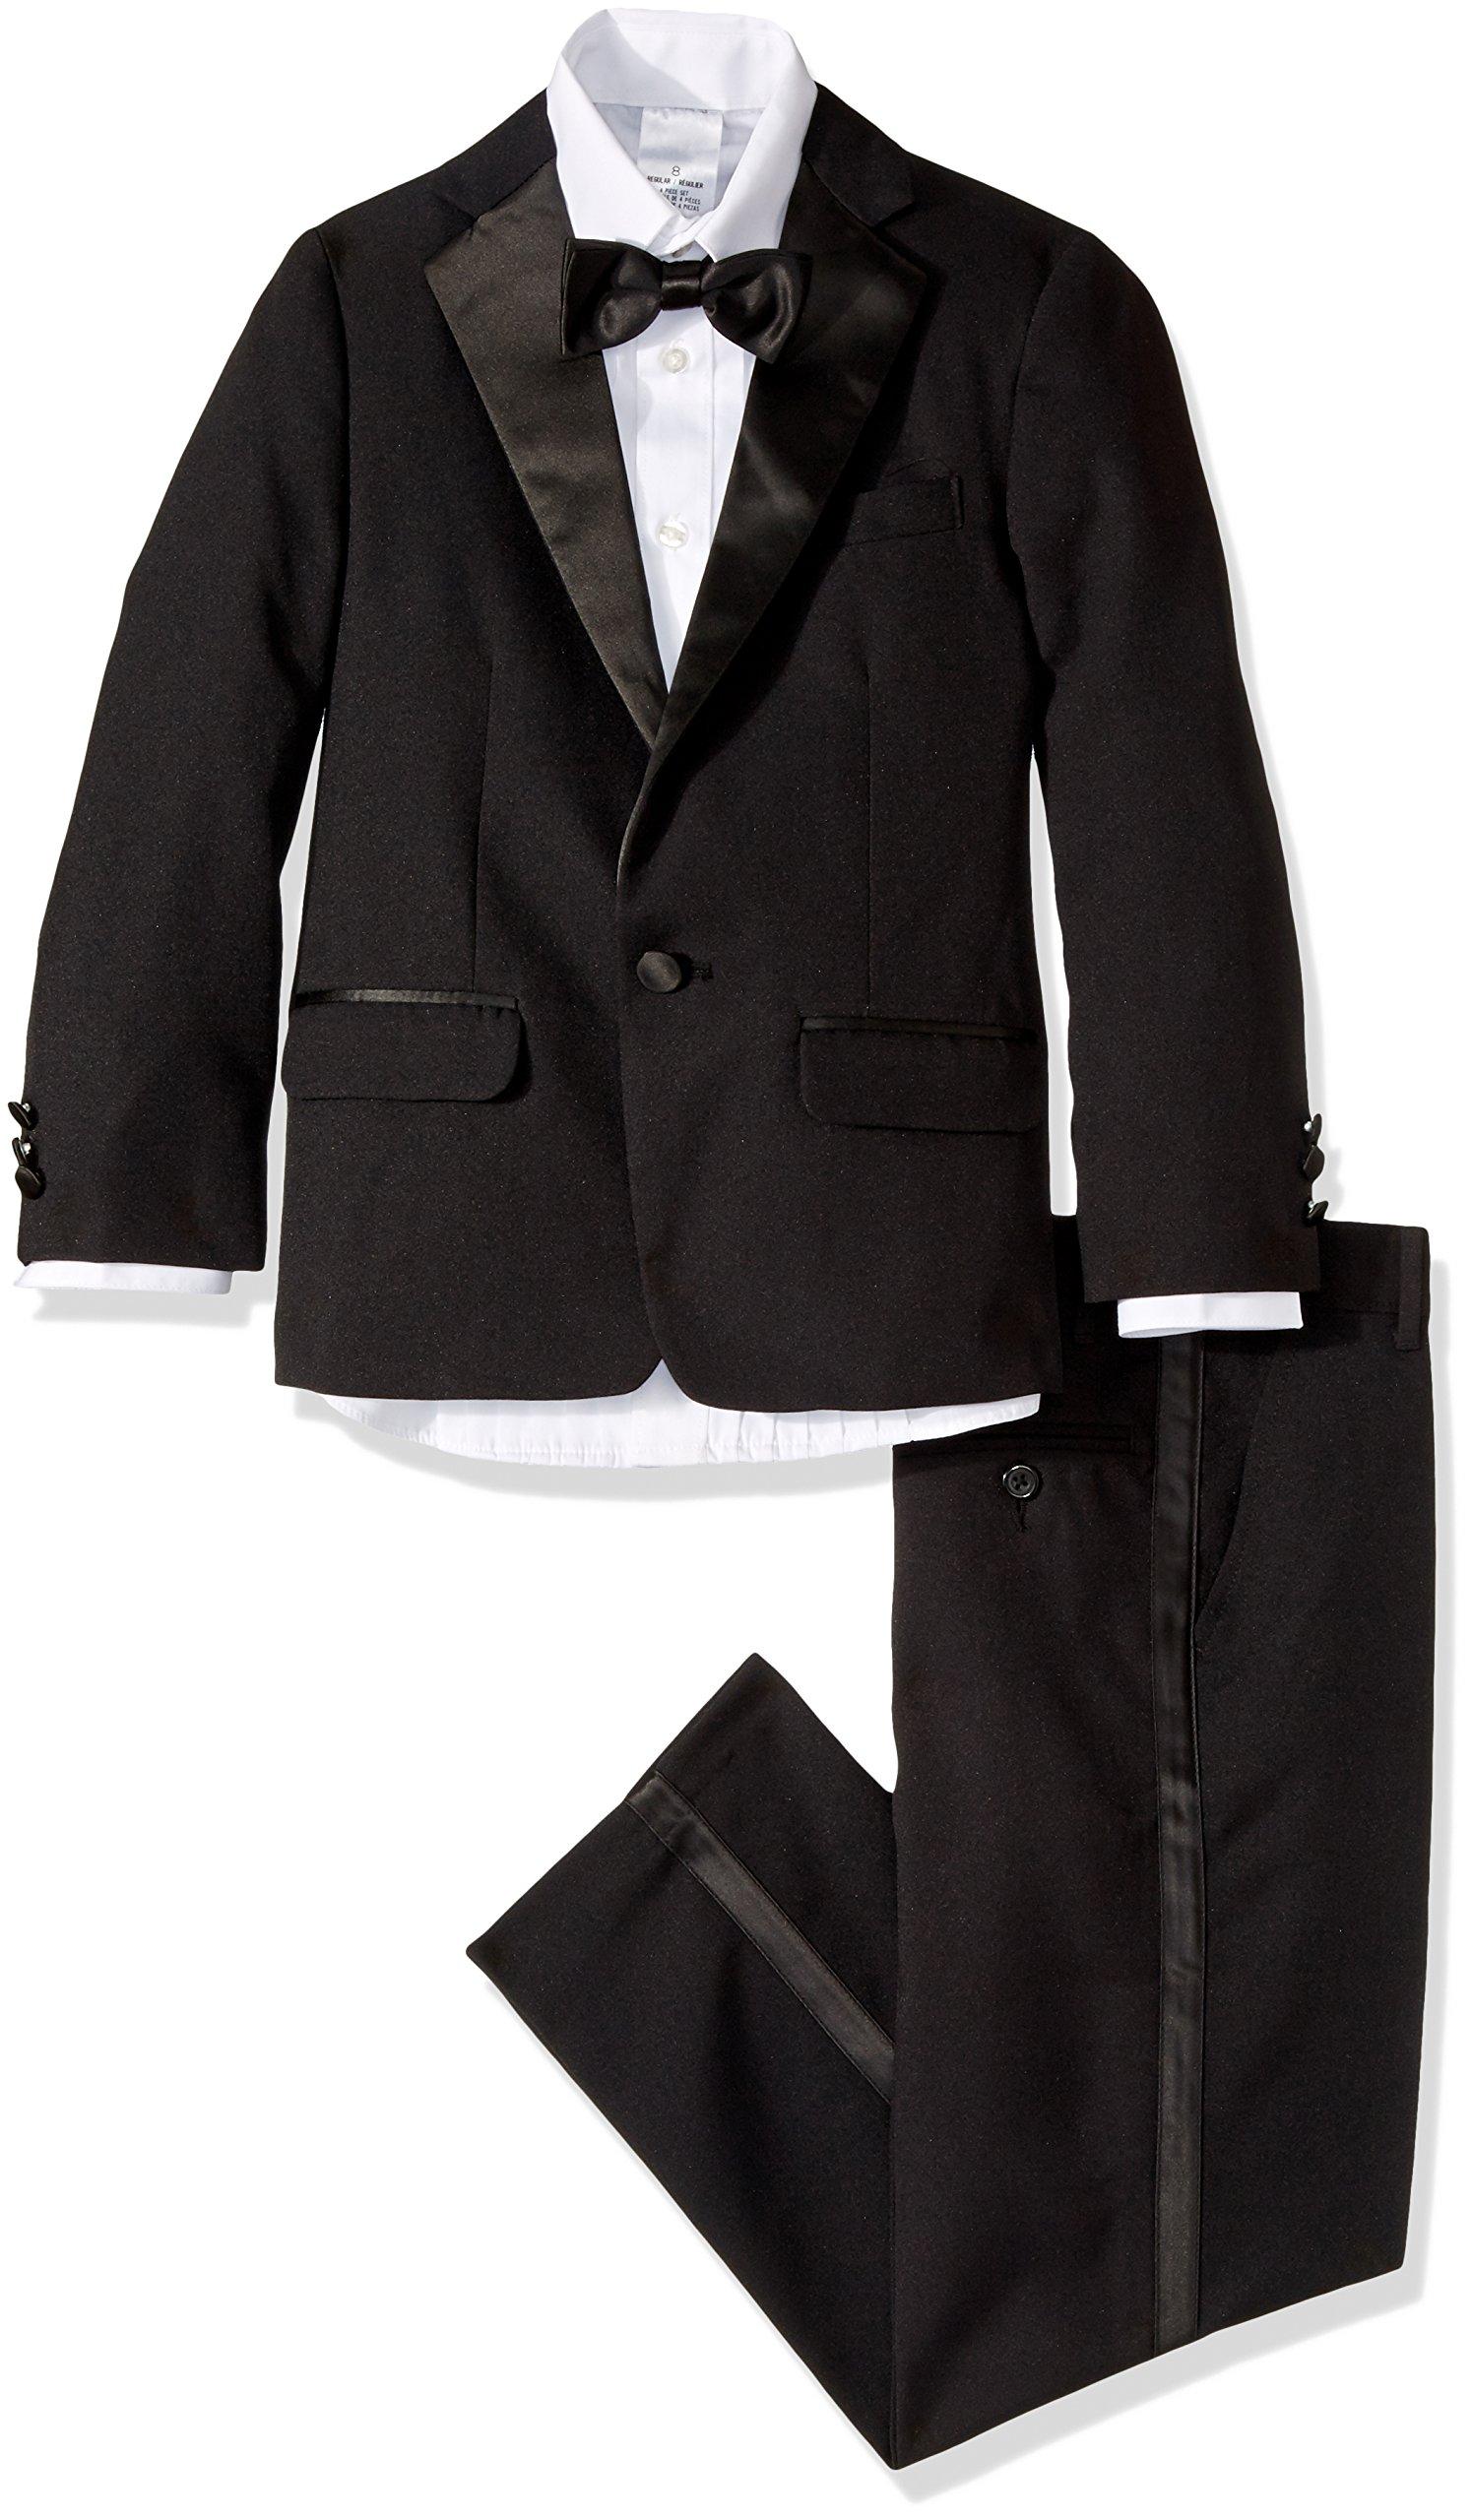 Nautica Boy's Big Tuxedo Set with Jacket, Pant, Shirt, and Bow Tie, Black, 10